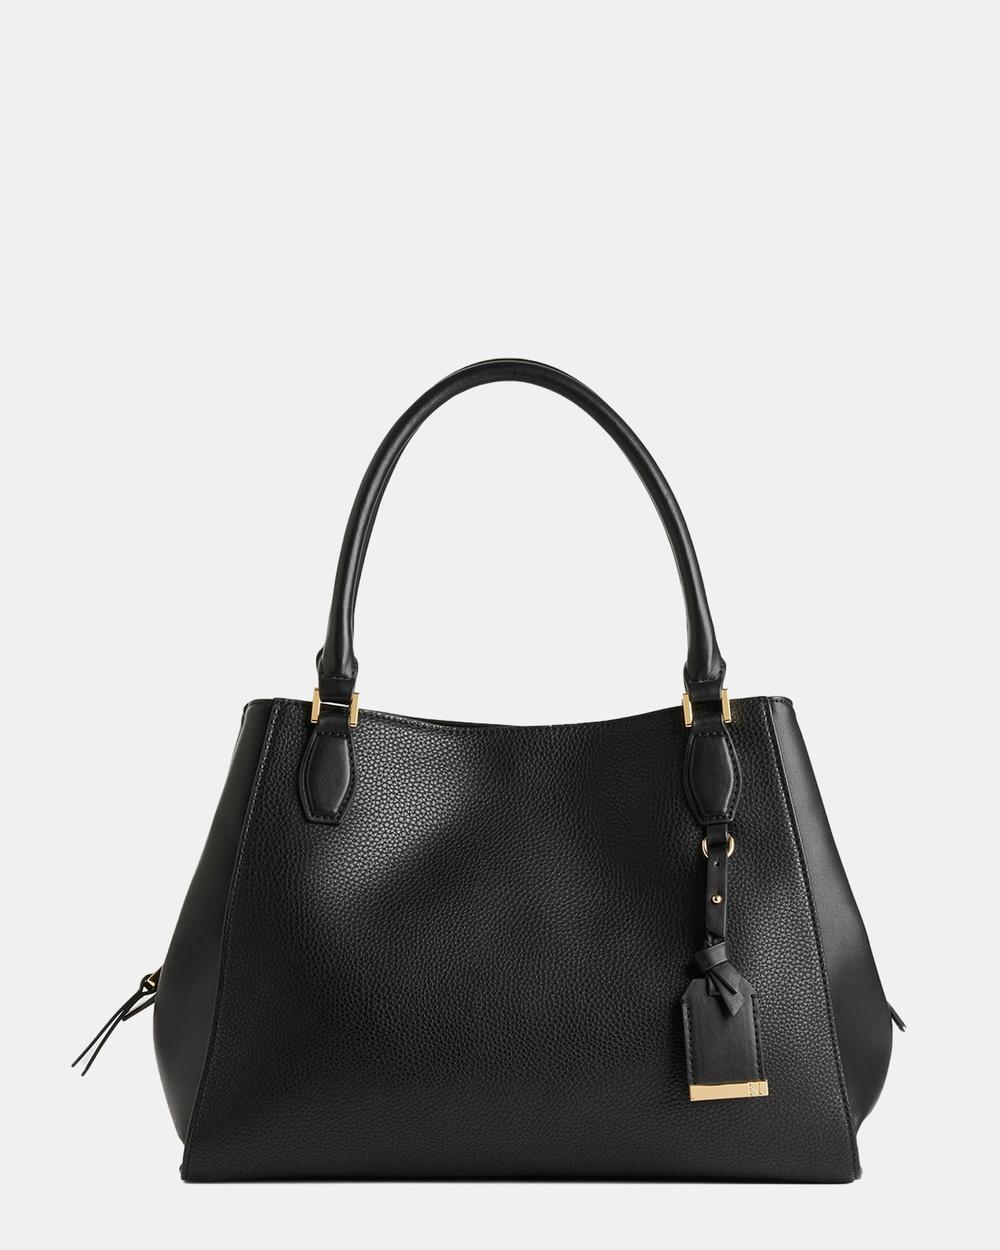 Naturalizer Westside Hobo Bag Handbags Black Handbags Australia